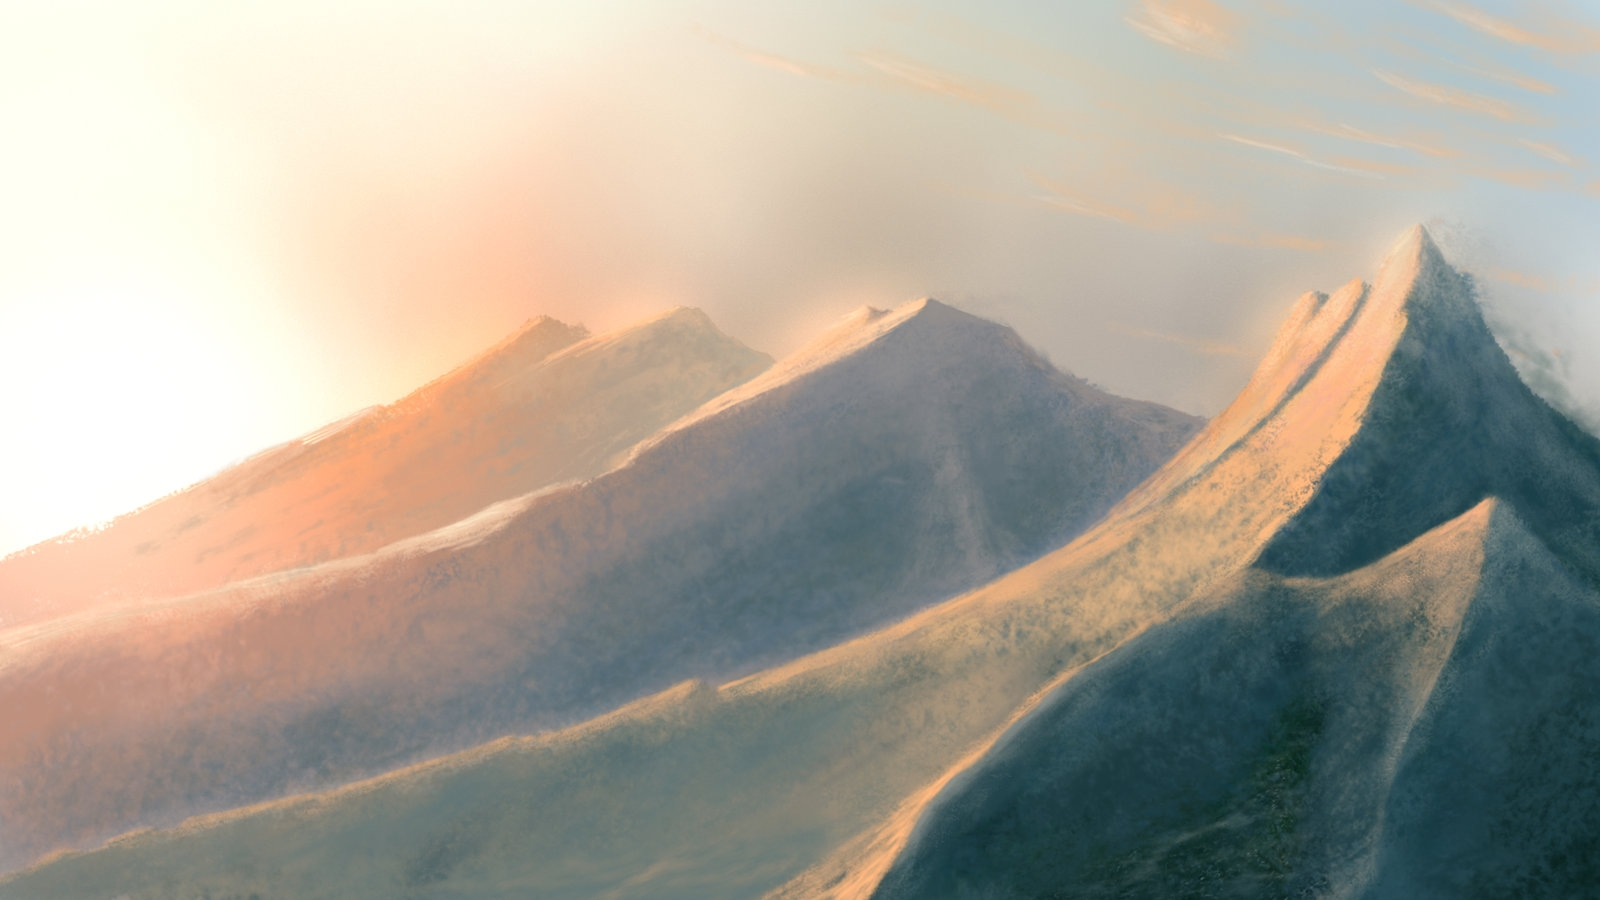 Great Wallpaper Mountain Simple - mountains-hd-widescreen-high-resolutions-backgrounds-wallpapers-laptop-desktop-004  Snapshot_752141.jpg